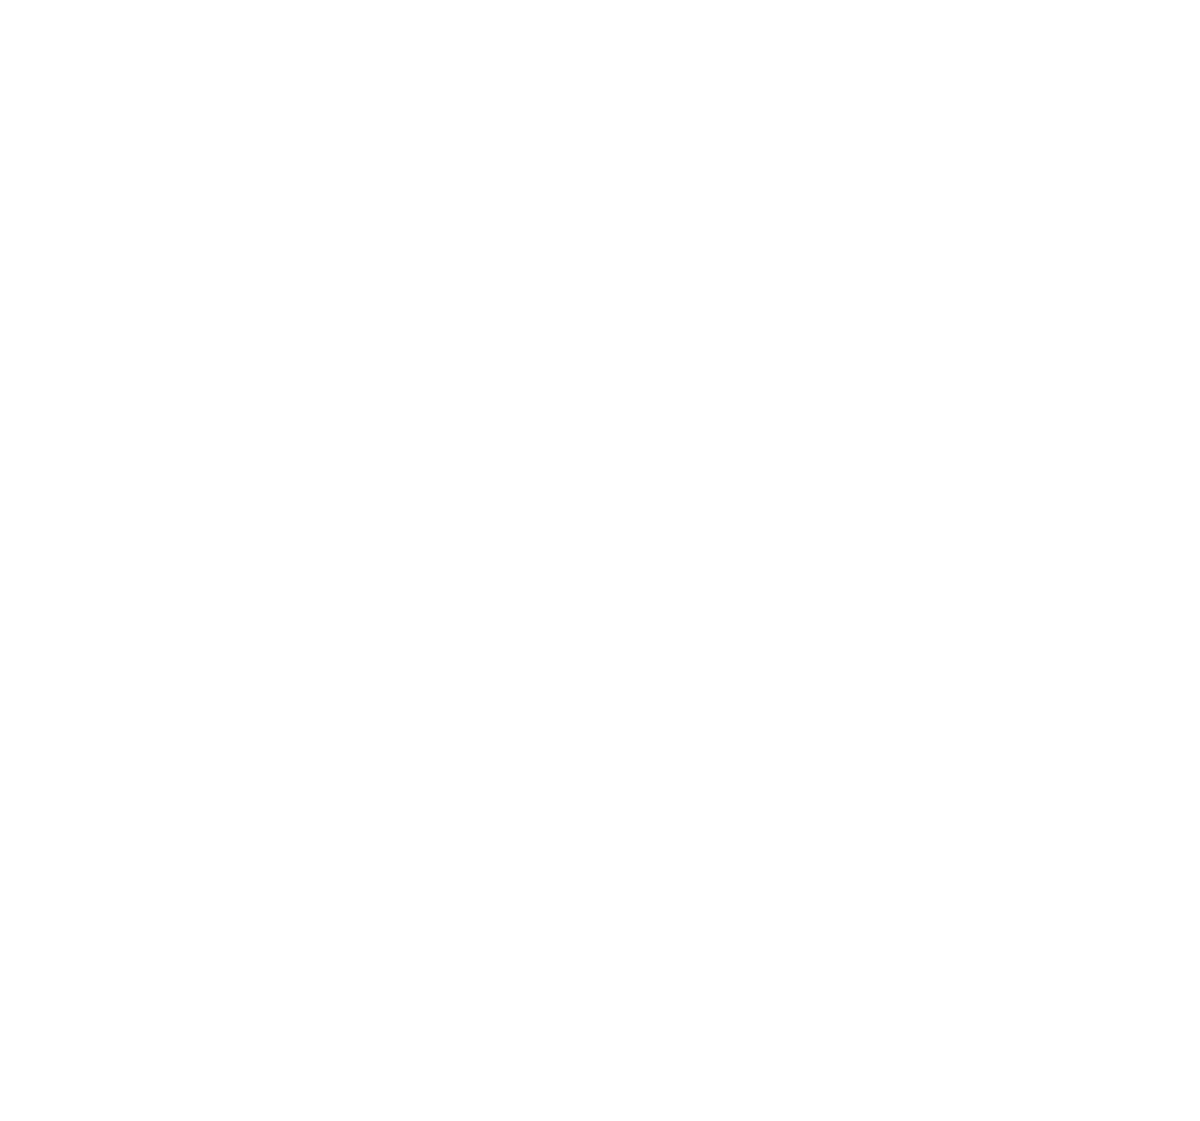 Logo for MVP, the loyalty program of Food Lion.